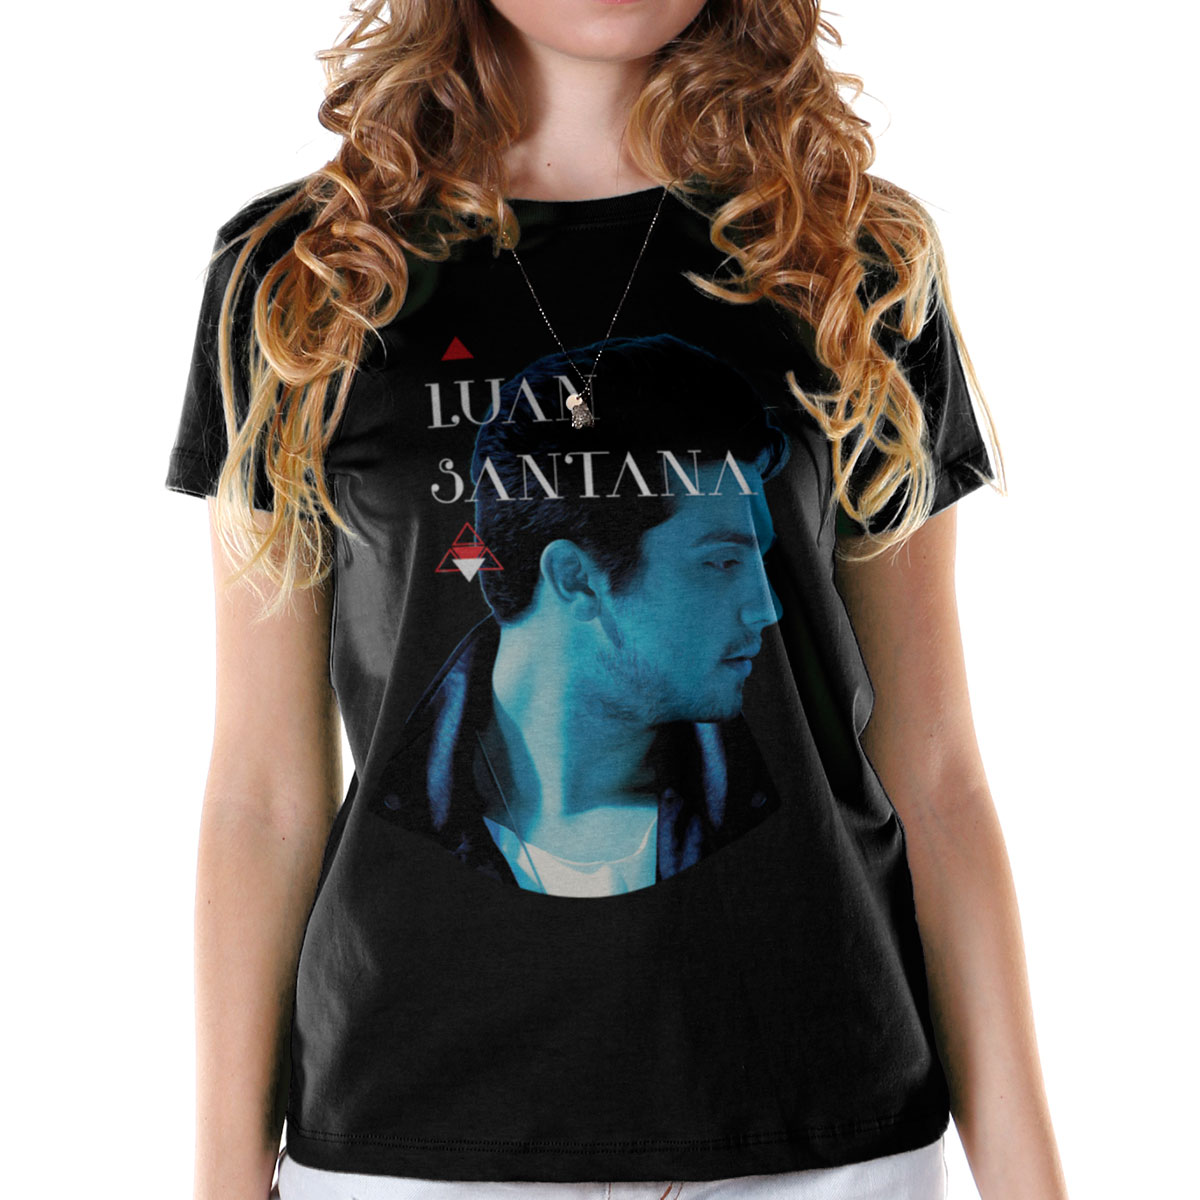 Camiseta Feminina Luan Santana Cantada